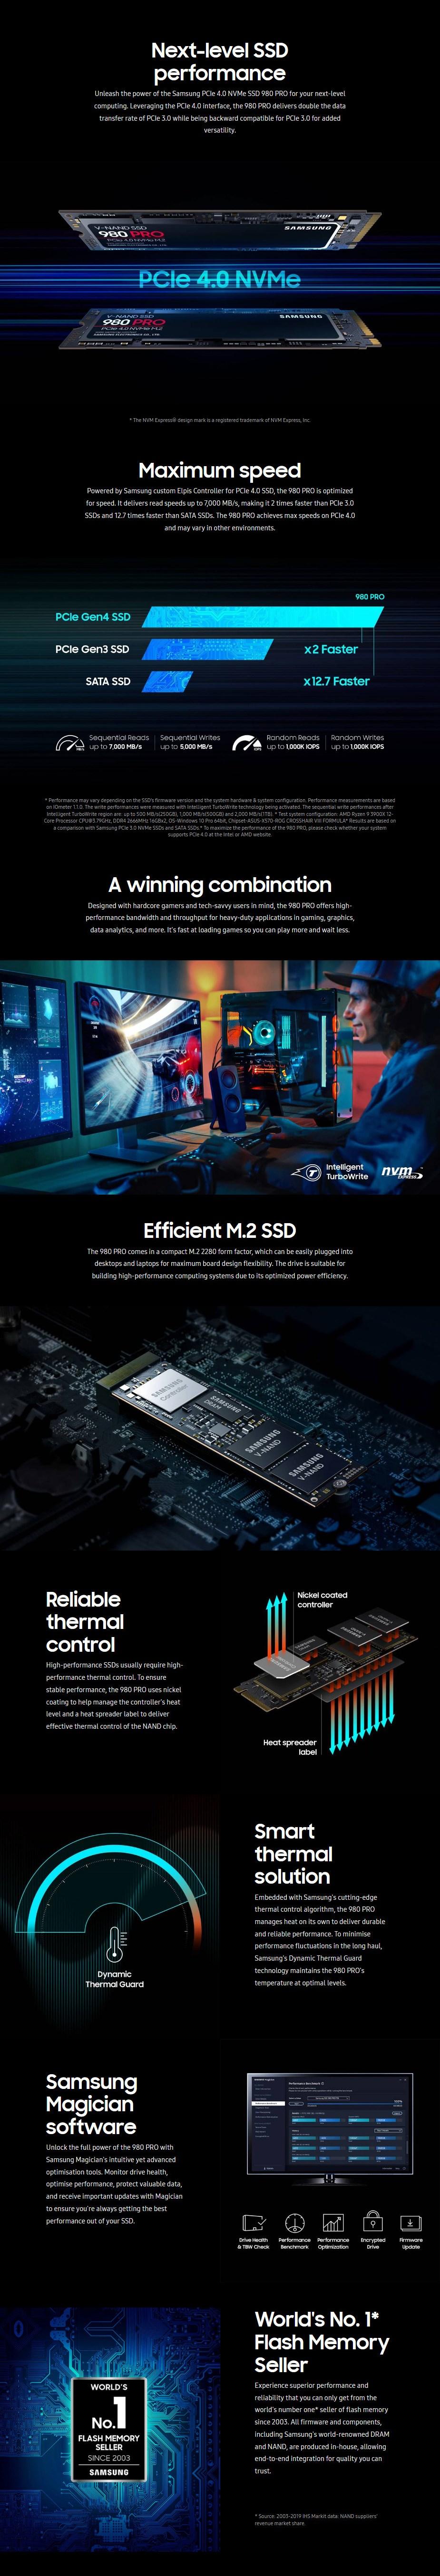 Samsung 980 Pro 250GB NVMe 1.3c M.2 (2280) V-NAND 3-Bit MLC SSD - MZ-V8P250BW - Overview 1